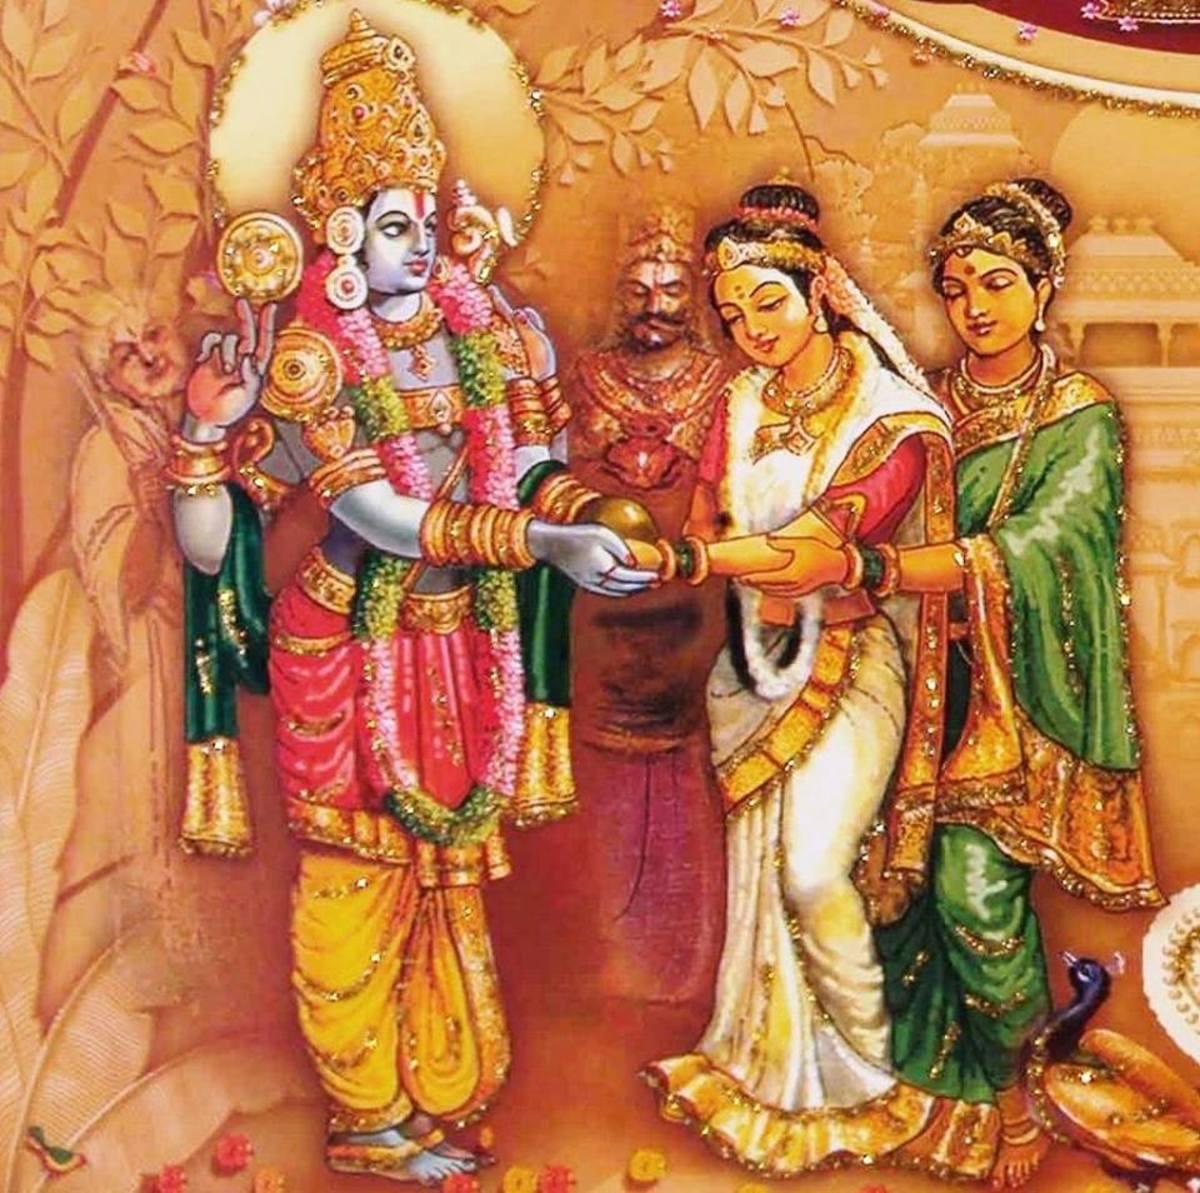 Artists depiction of Vishnu marrying Padmavati